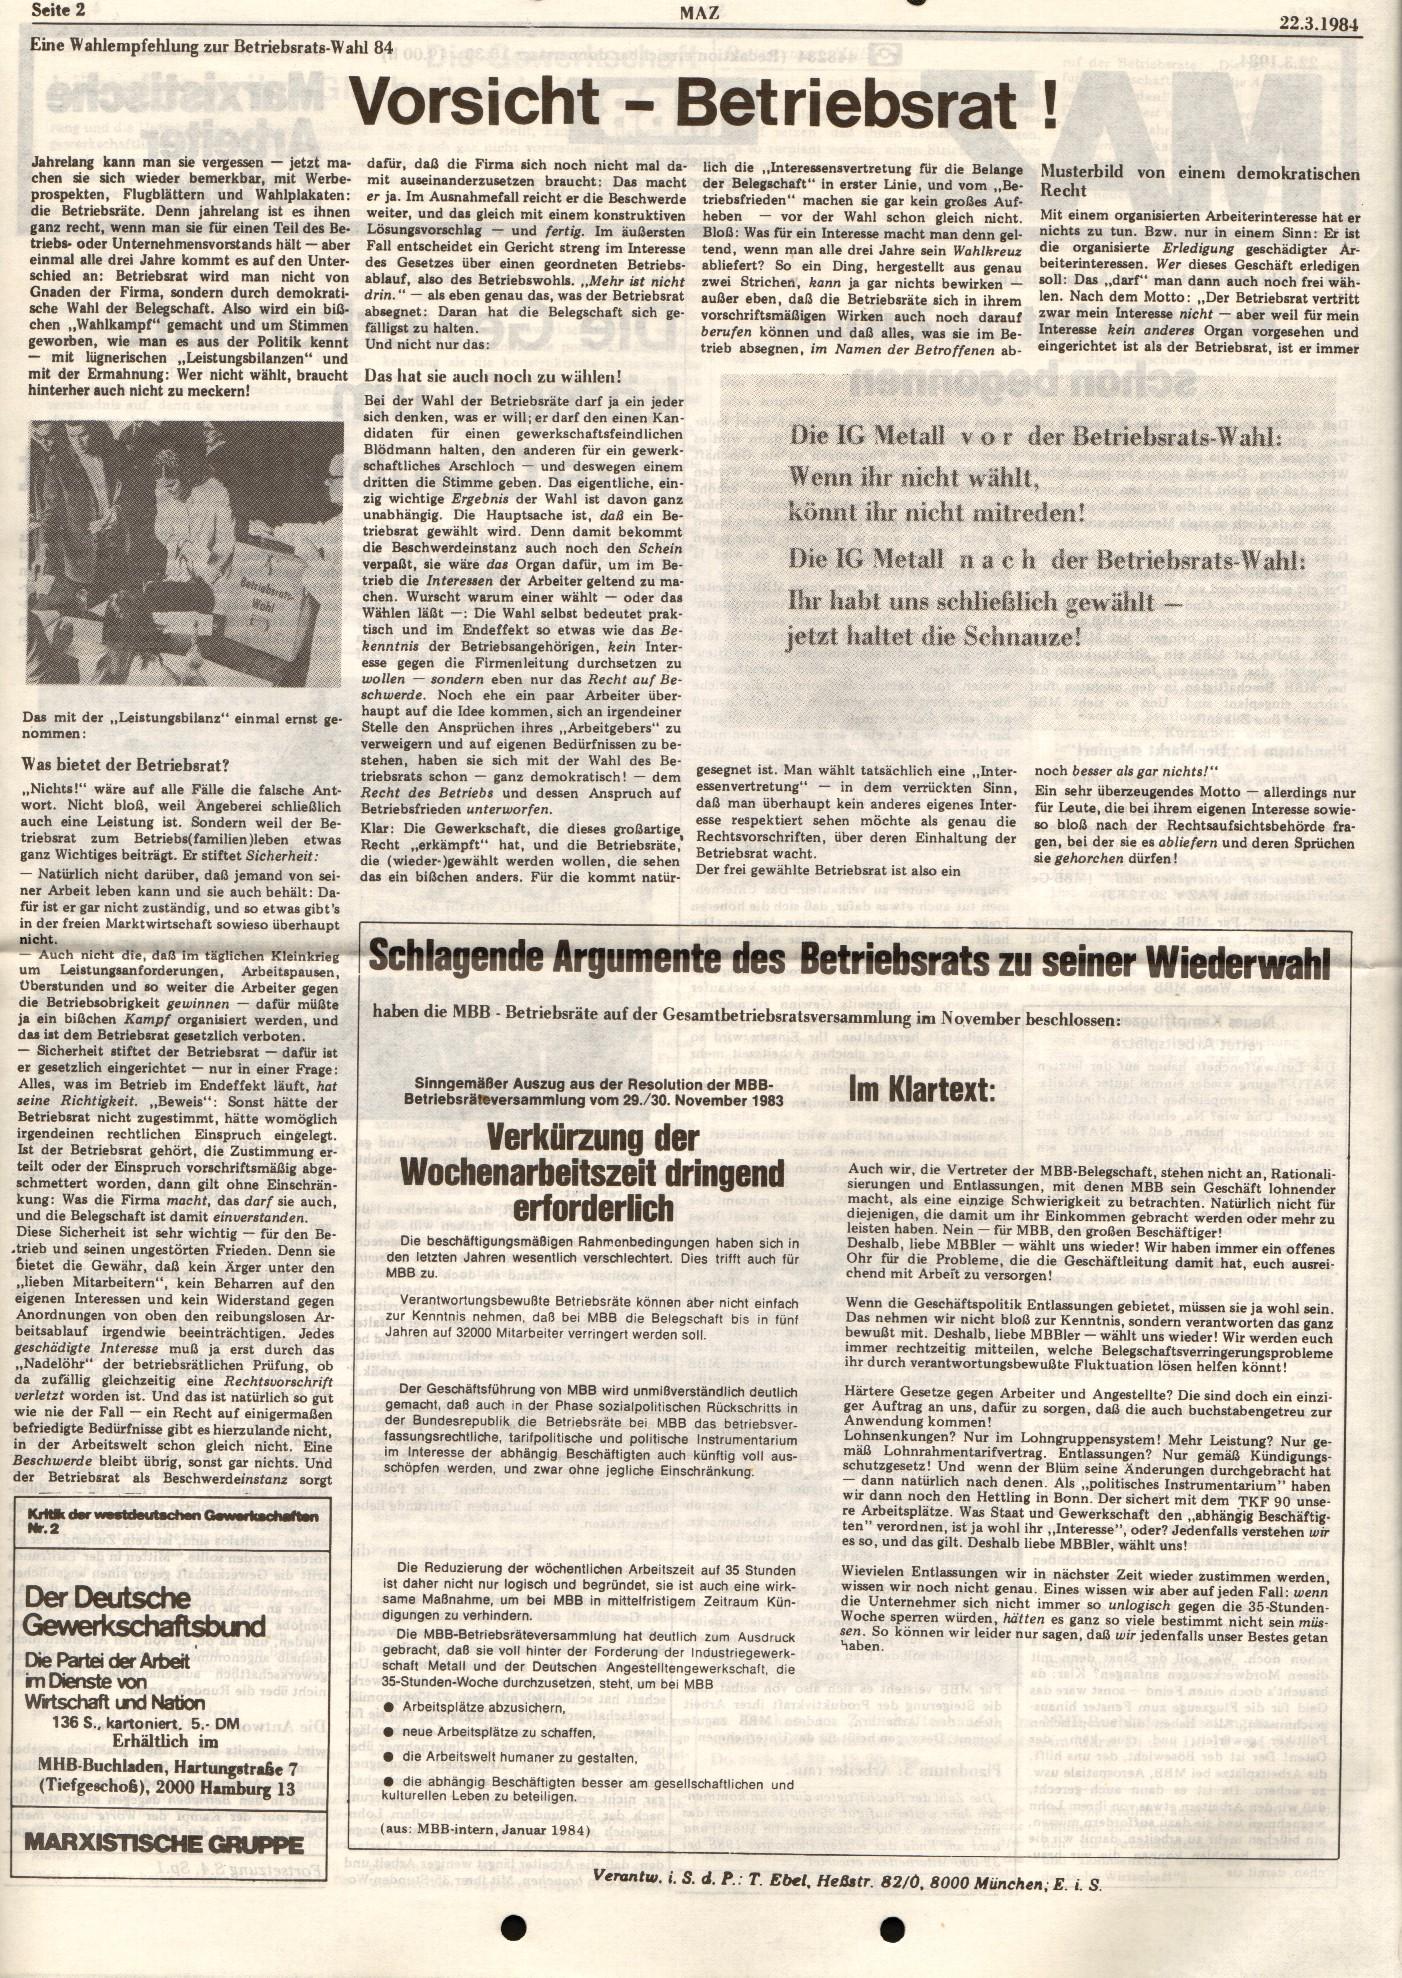 Hamburg_MG_MAZ_MBB_19840322_02